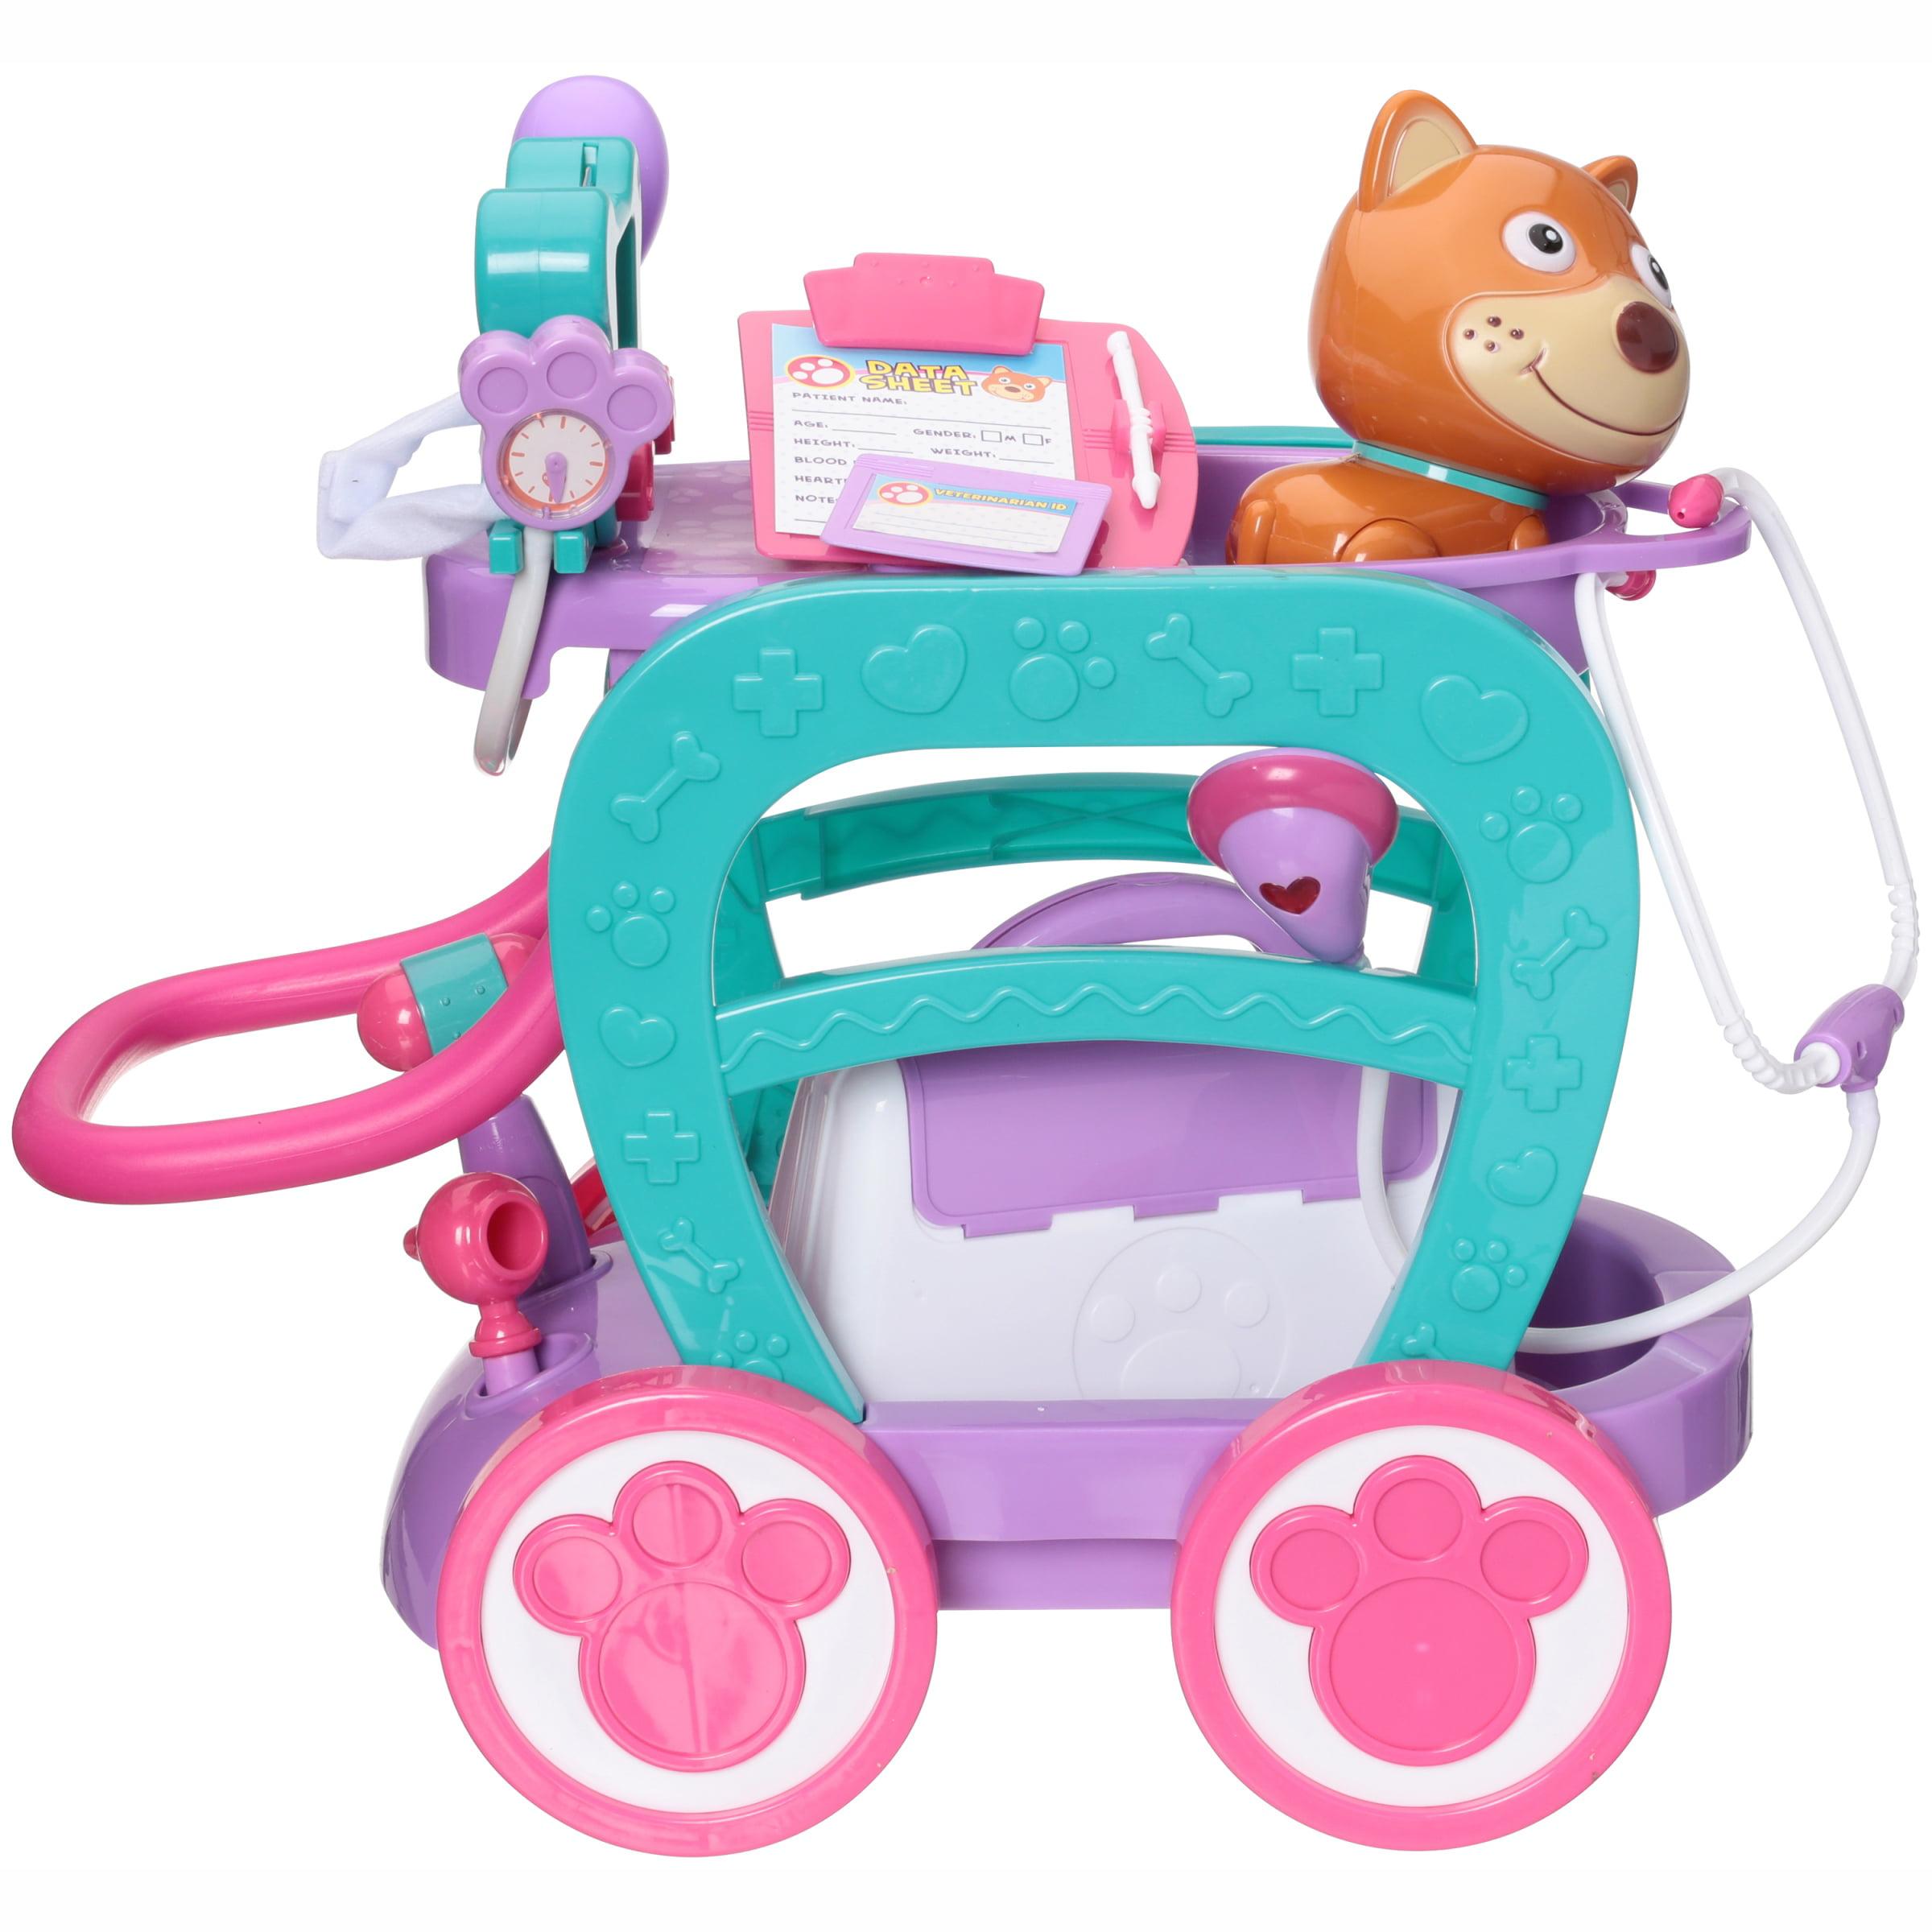 Kid Connection Veterinary Cart - Walmart.com